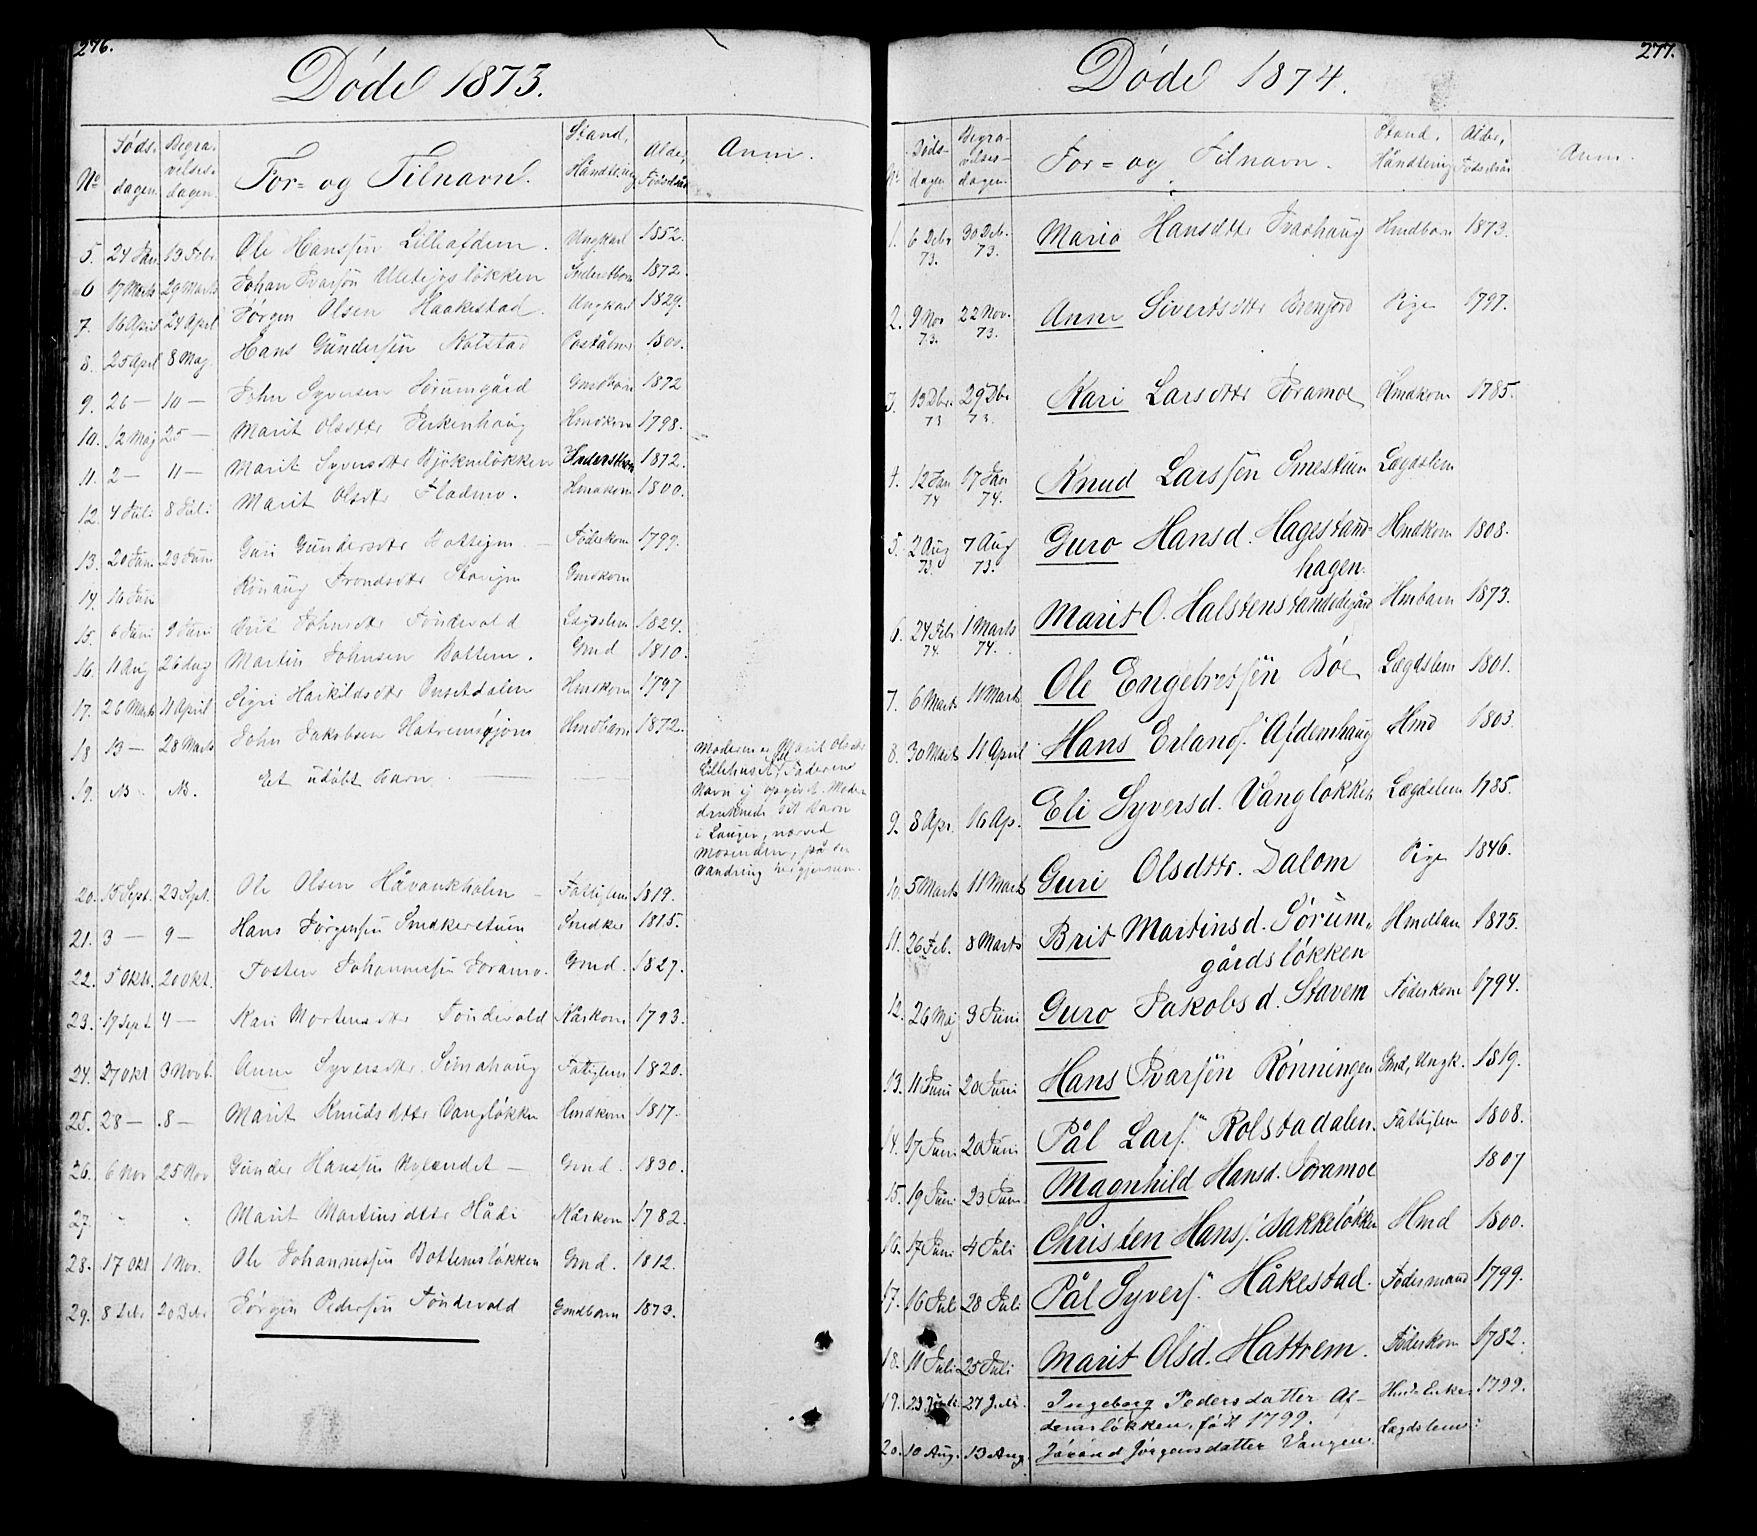 SAH, Lesja prestekontor, Klokkerbok nr. 5, 1850-1894, s. 276-277